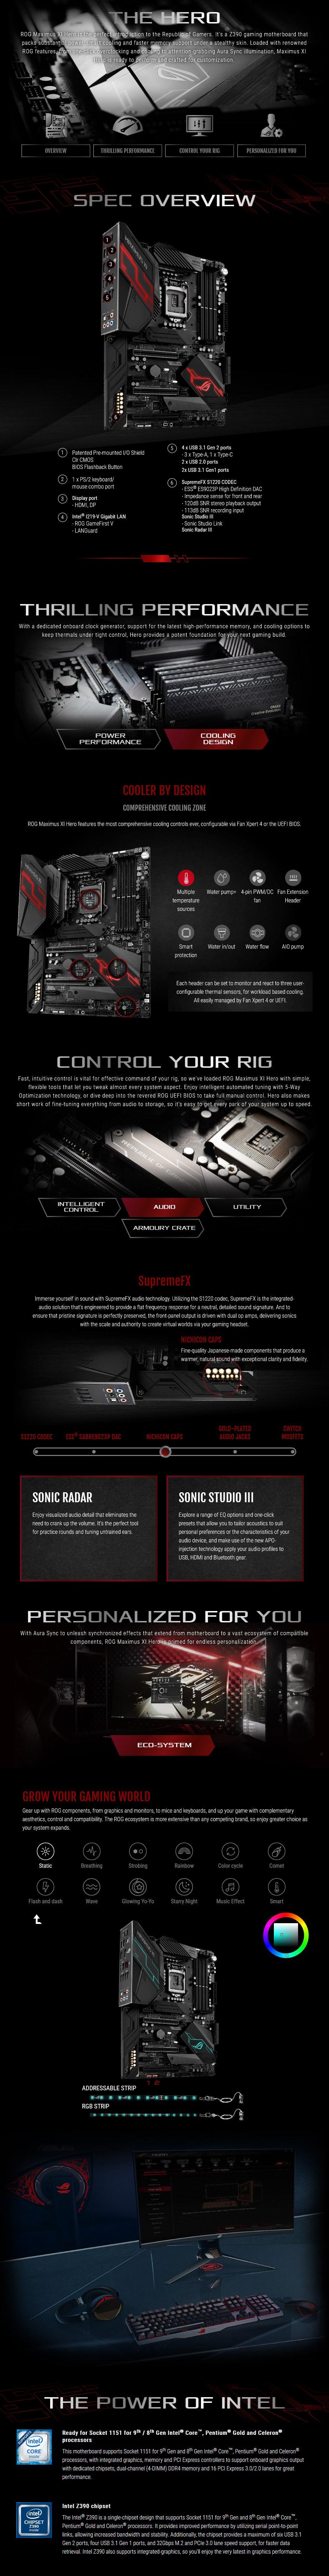 ASUS ROG Z390 MAXIMUS XI HERO LGA 1151 ATX Motherboard - Desktop Overview 1